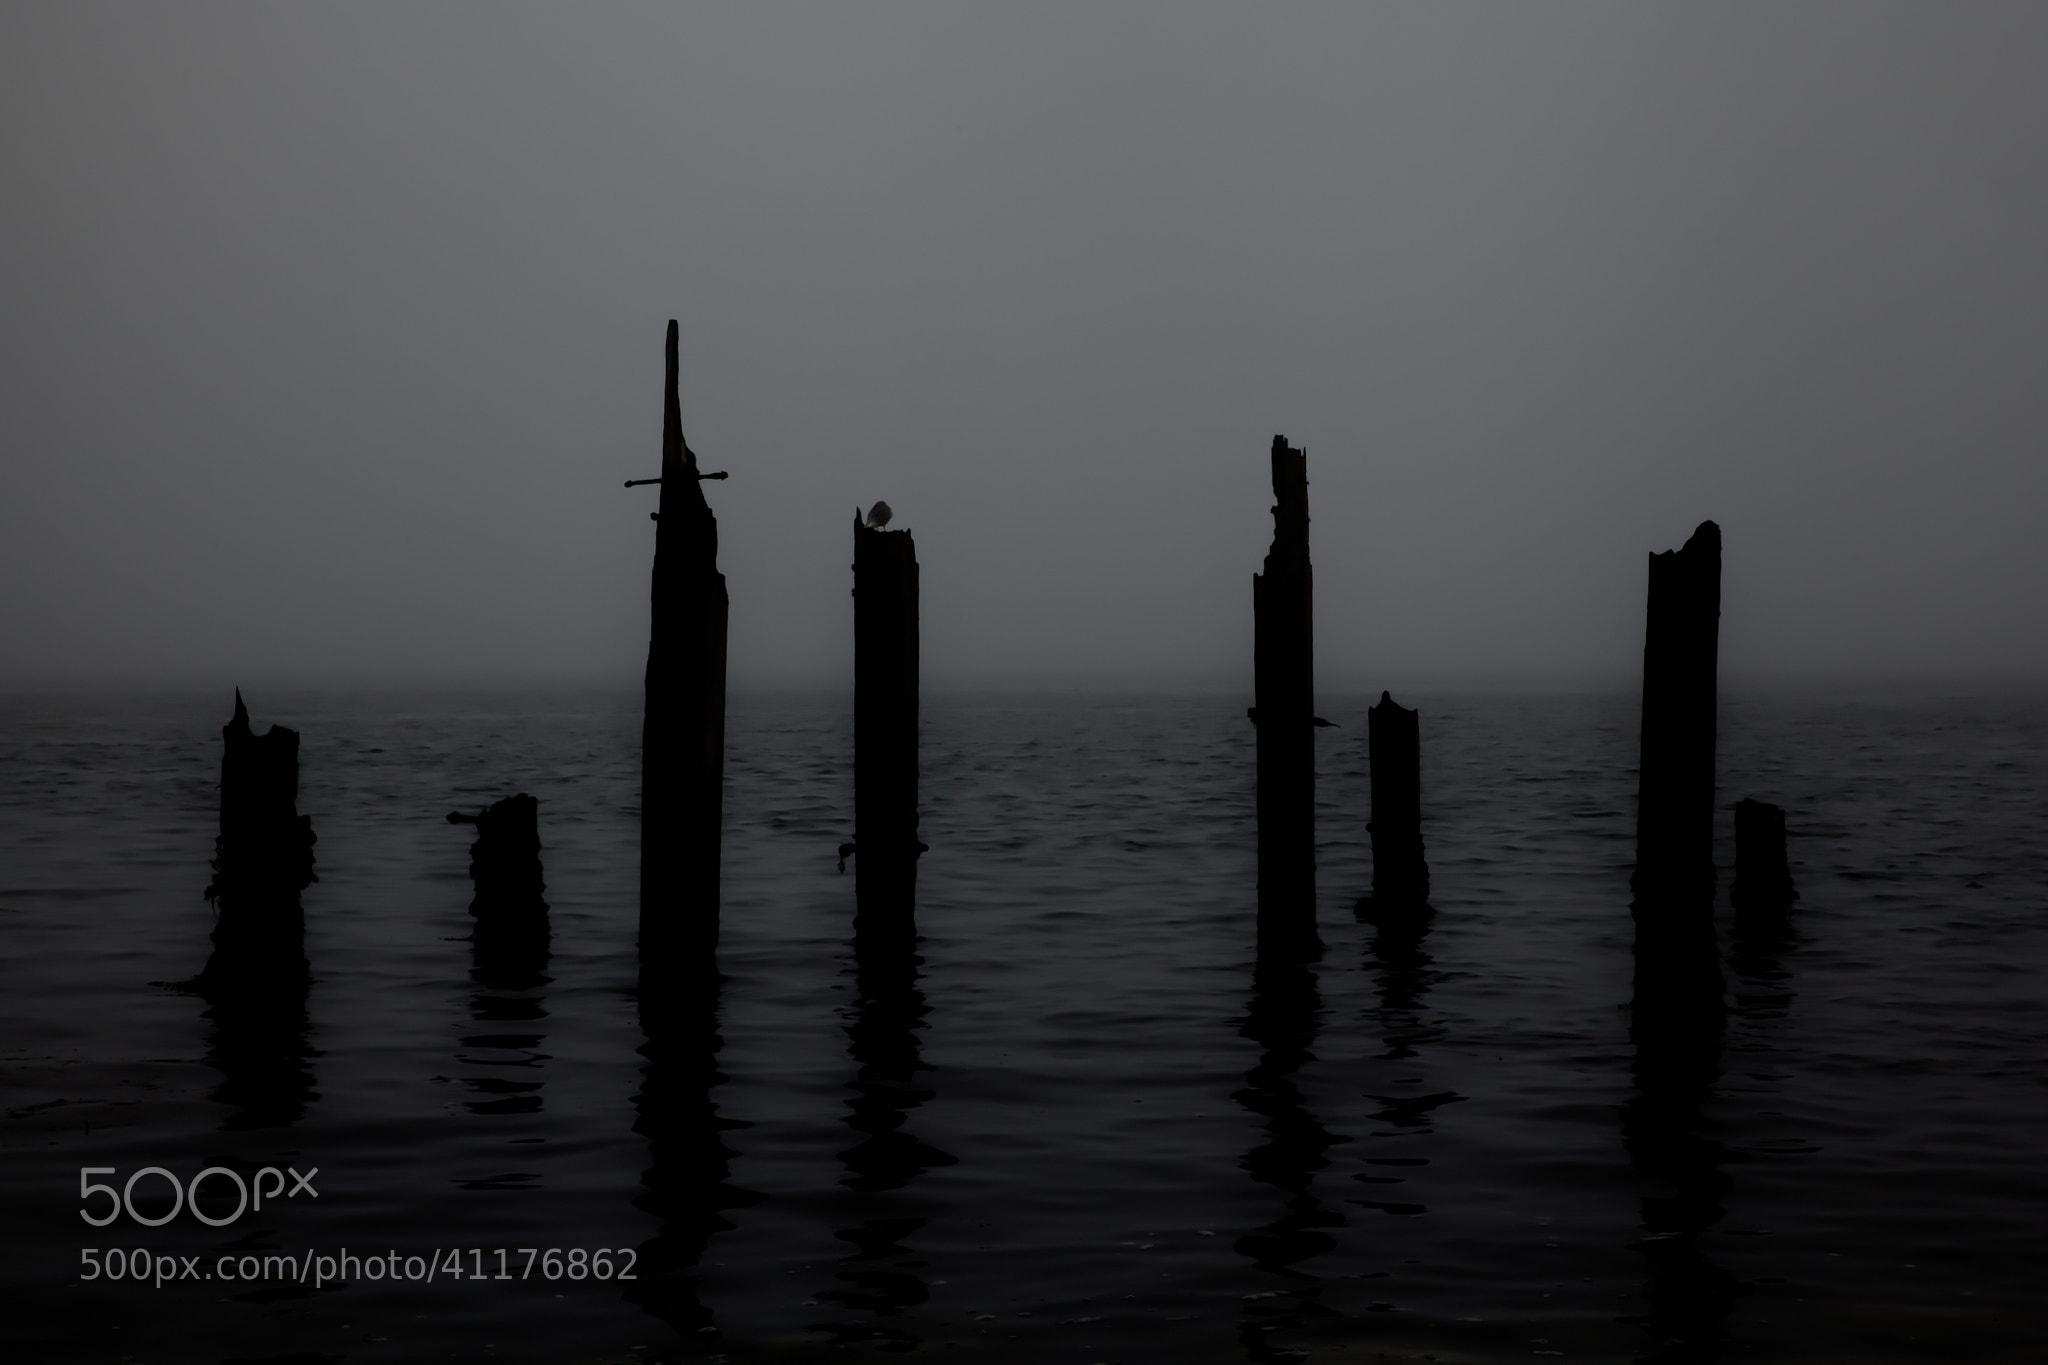 Photograph Broken silence by Graeme MacDonald on 500px